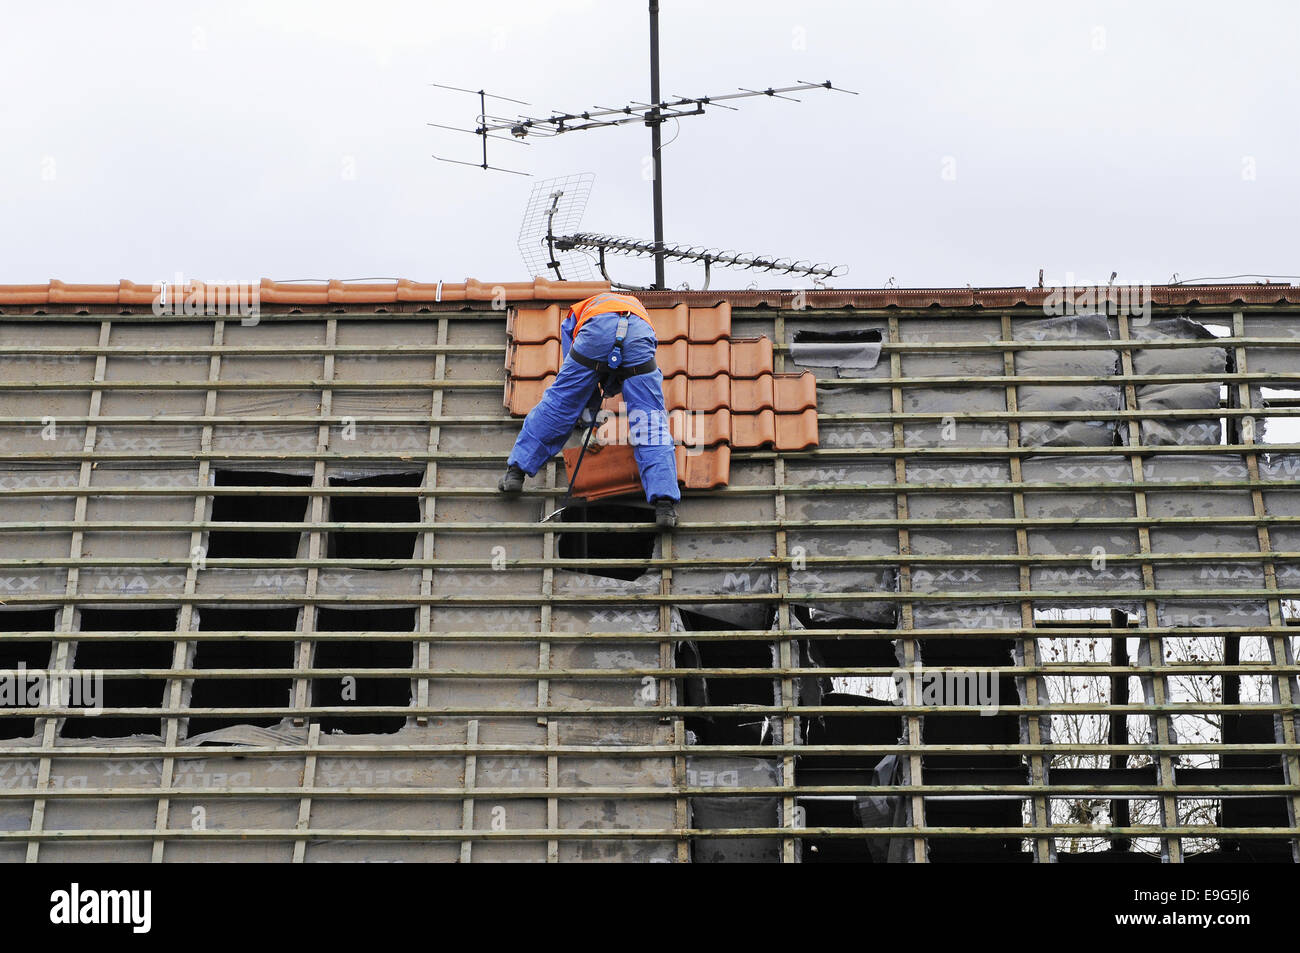 construction site, Dortmund, Germany - Stock Image